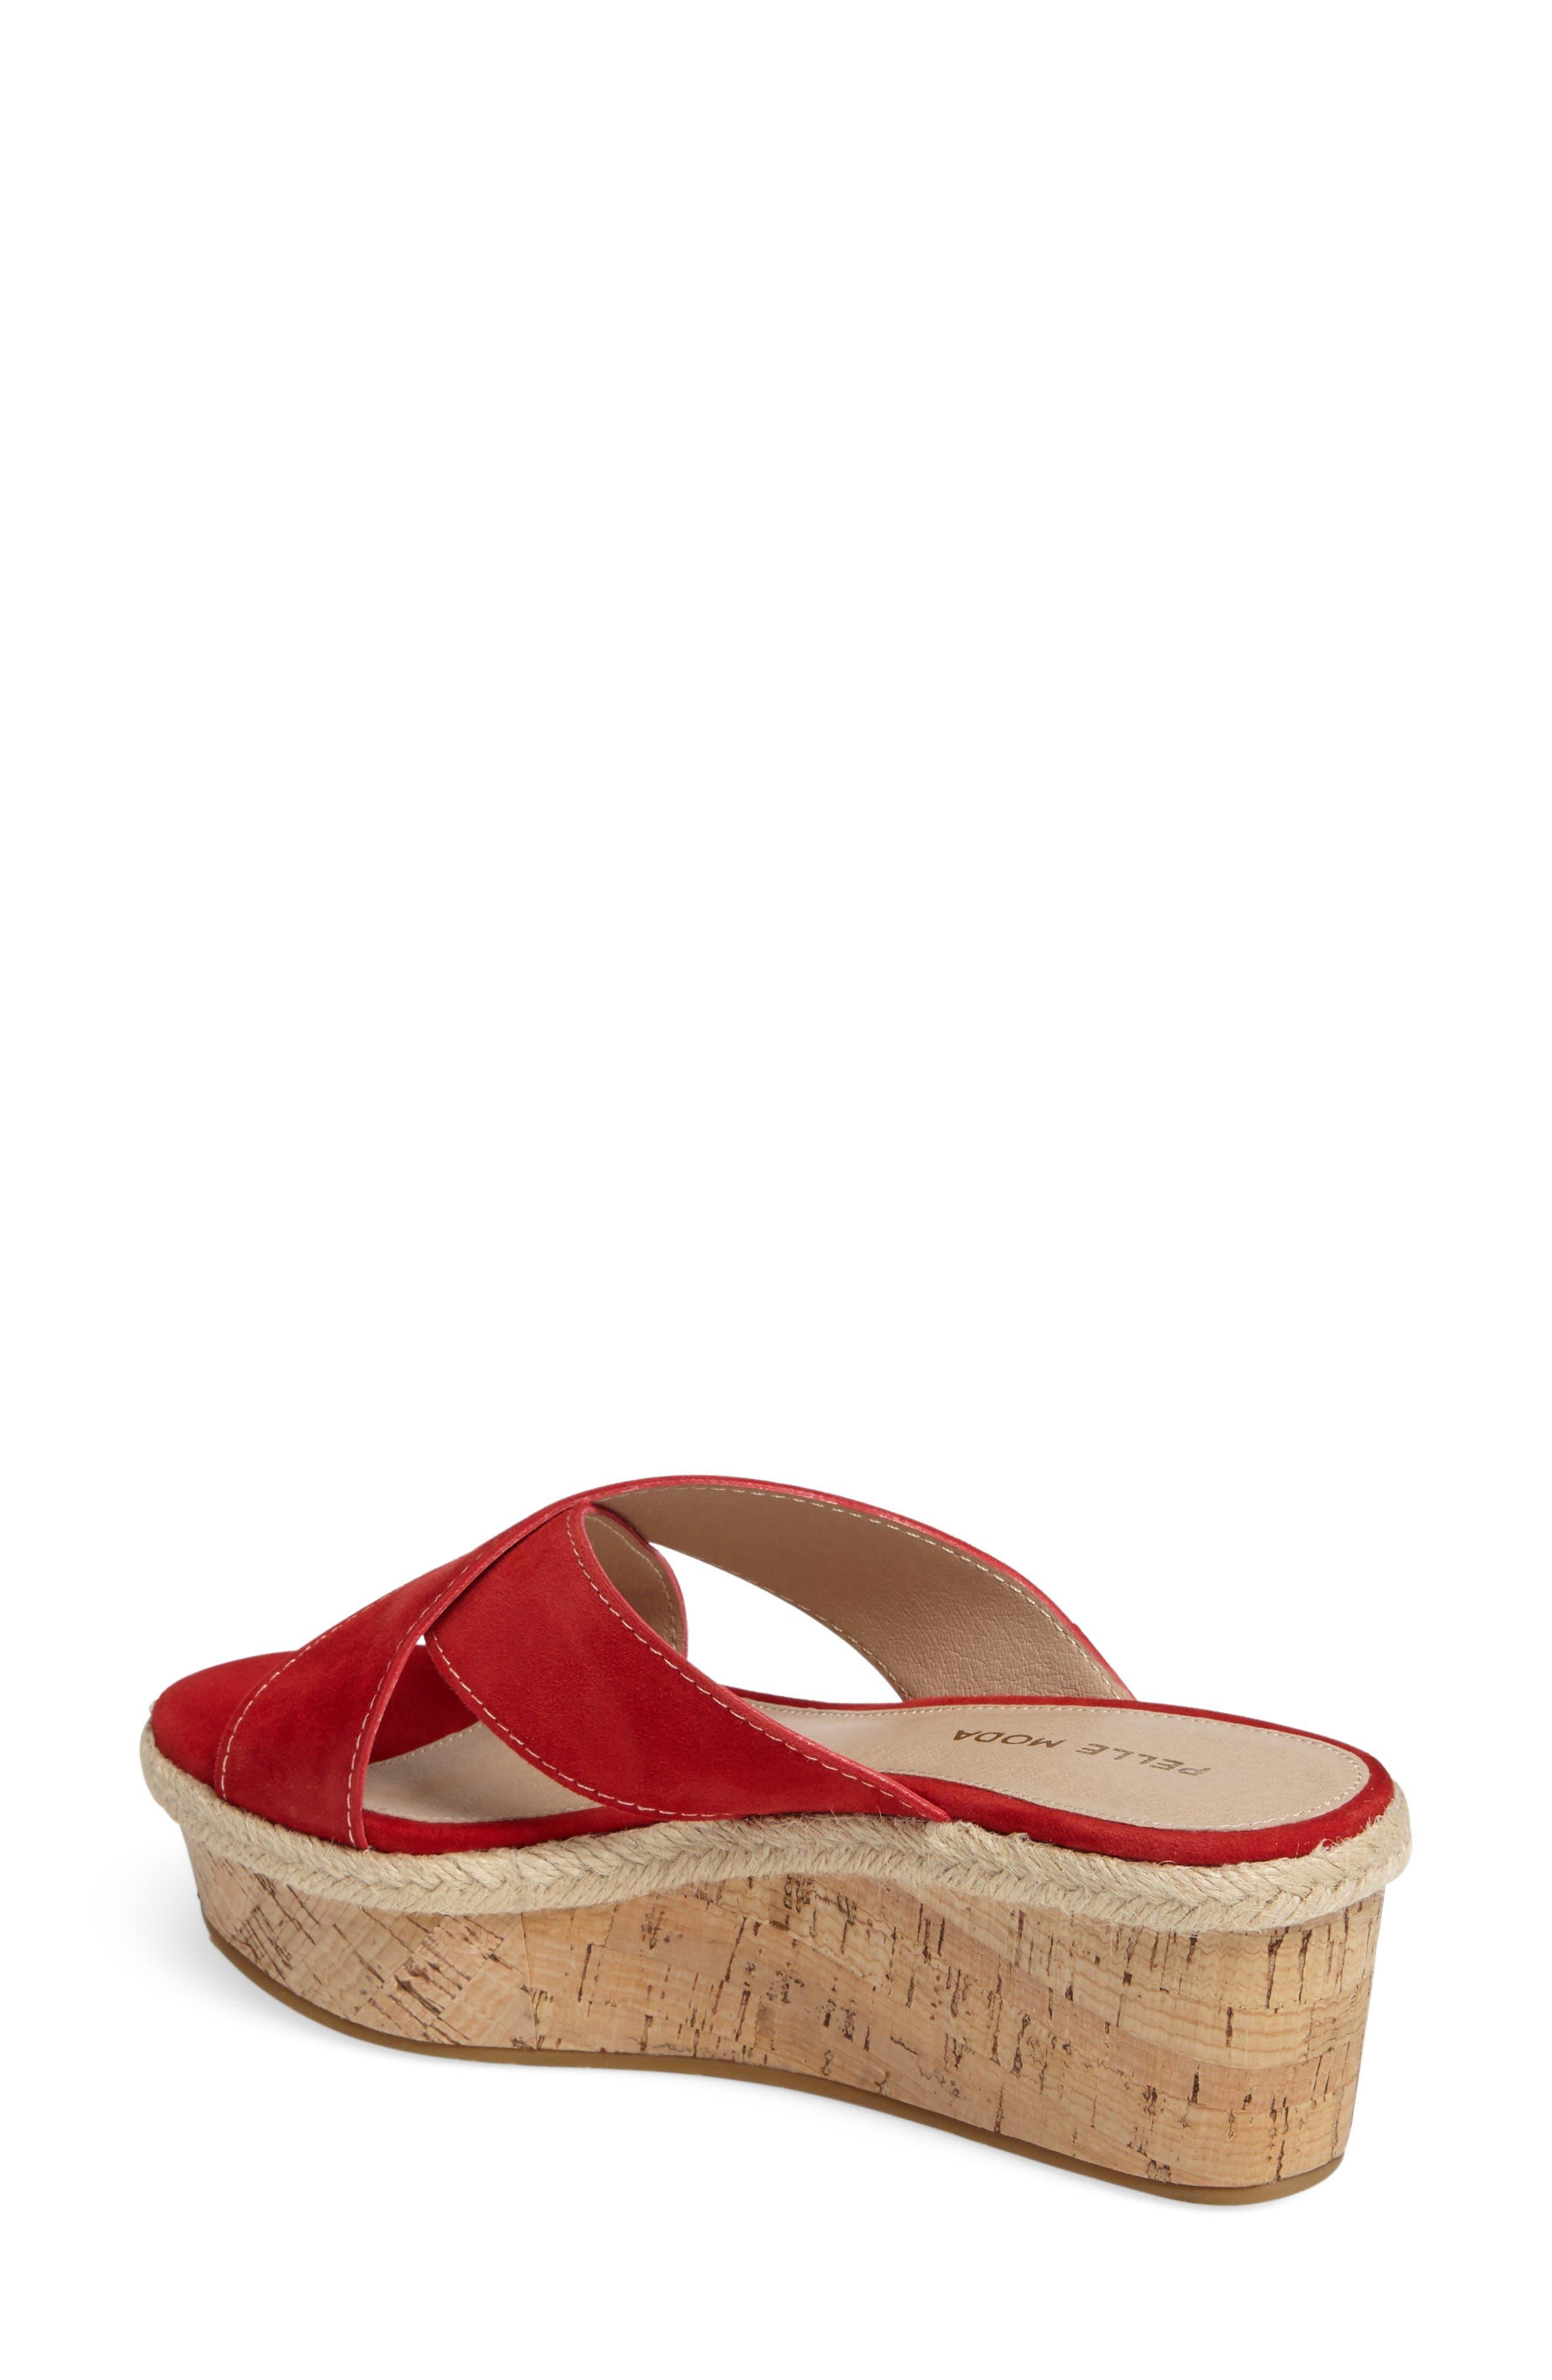 Harriet Platform Wedge Sandal,                             Alternate thumbnail 2, color,                             Lipstick Leather